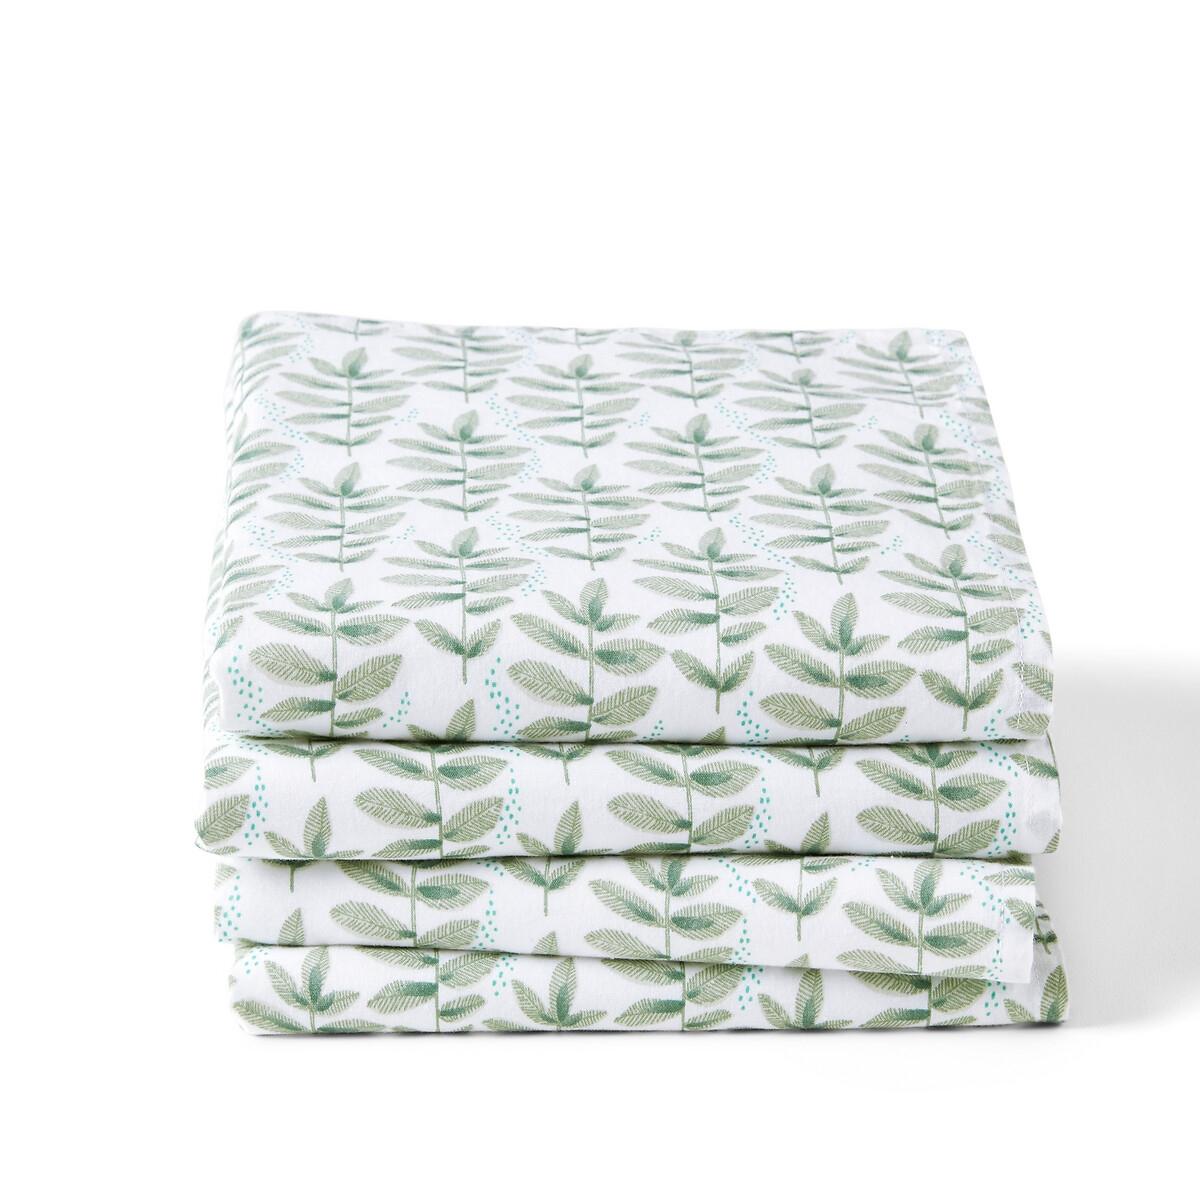 Комплект из 4 столовых полотенец La Redoute Evergreen 45 x 45 см зеленый комплект из столовых салфеток la redoute из стираного хлопка twinkle 45 x 45 см каштановый